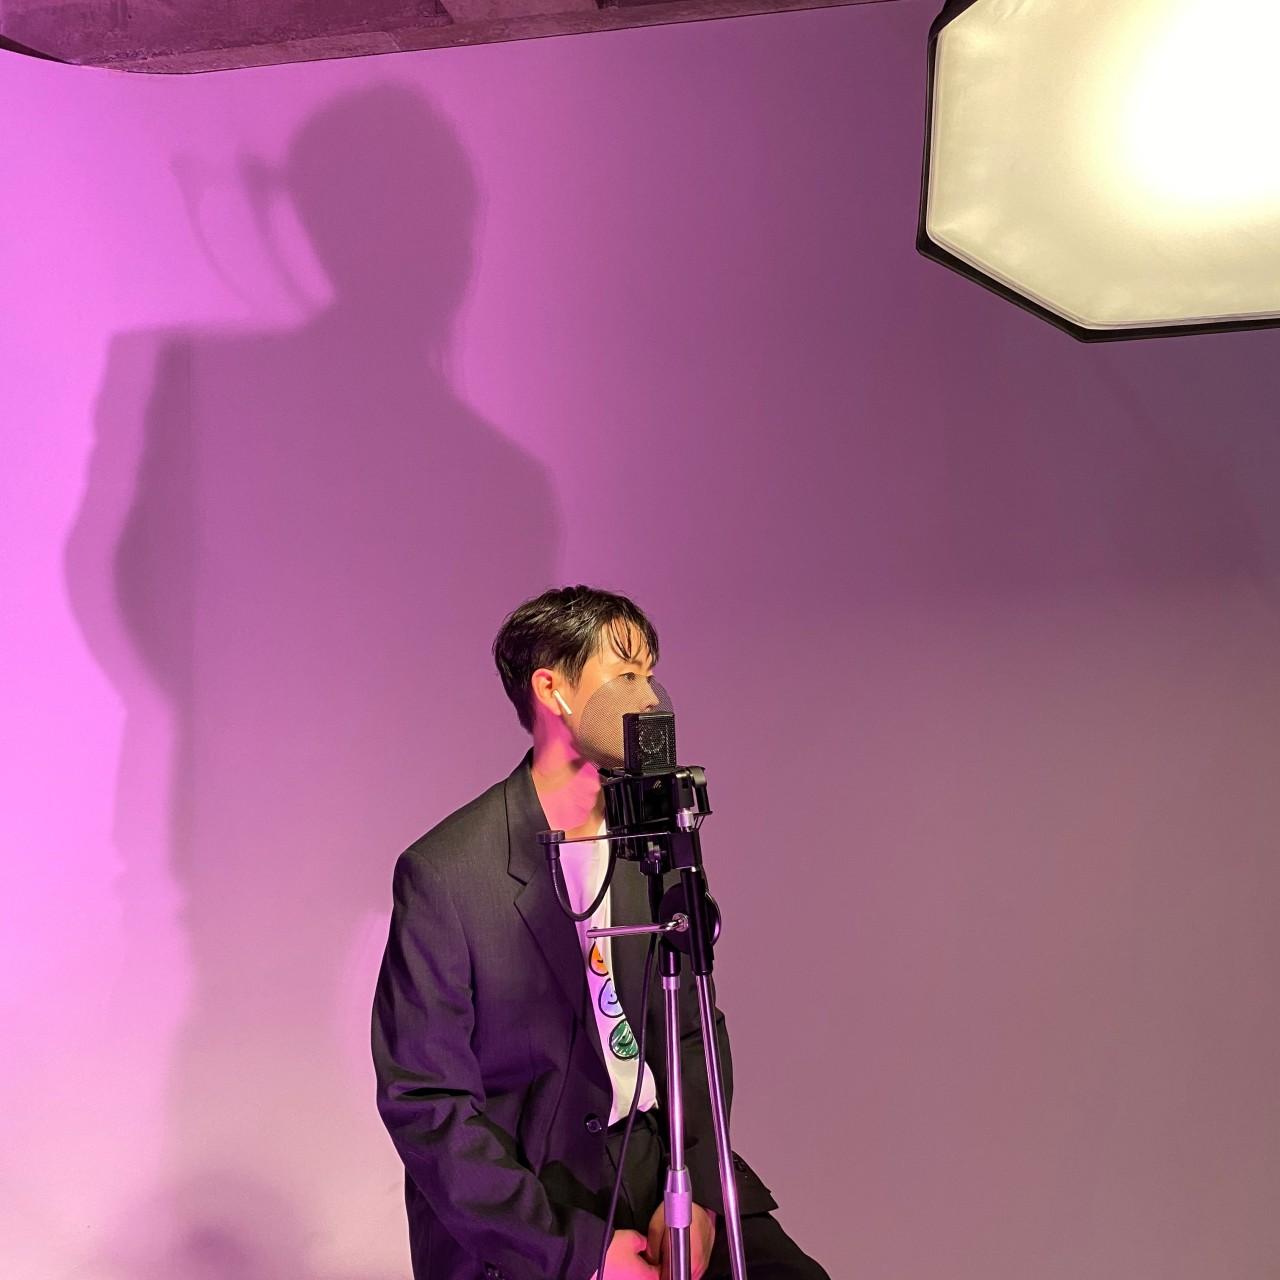 South Korean singer-songwriter Jimmy Brown (Courtesy of the artist)